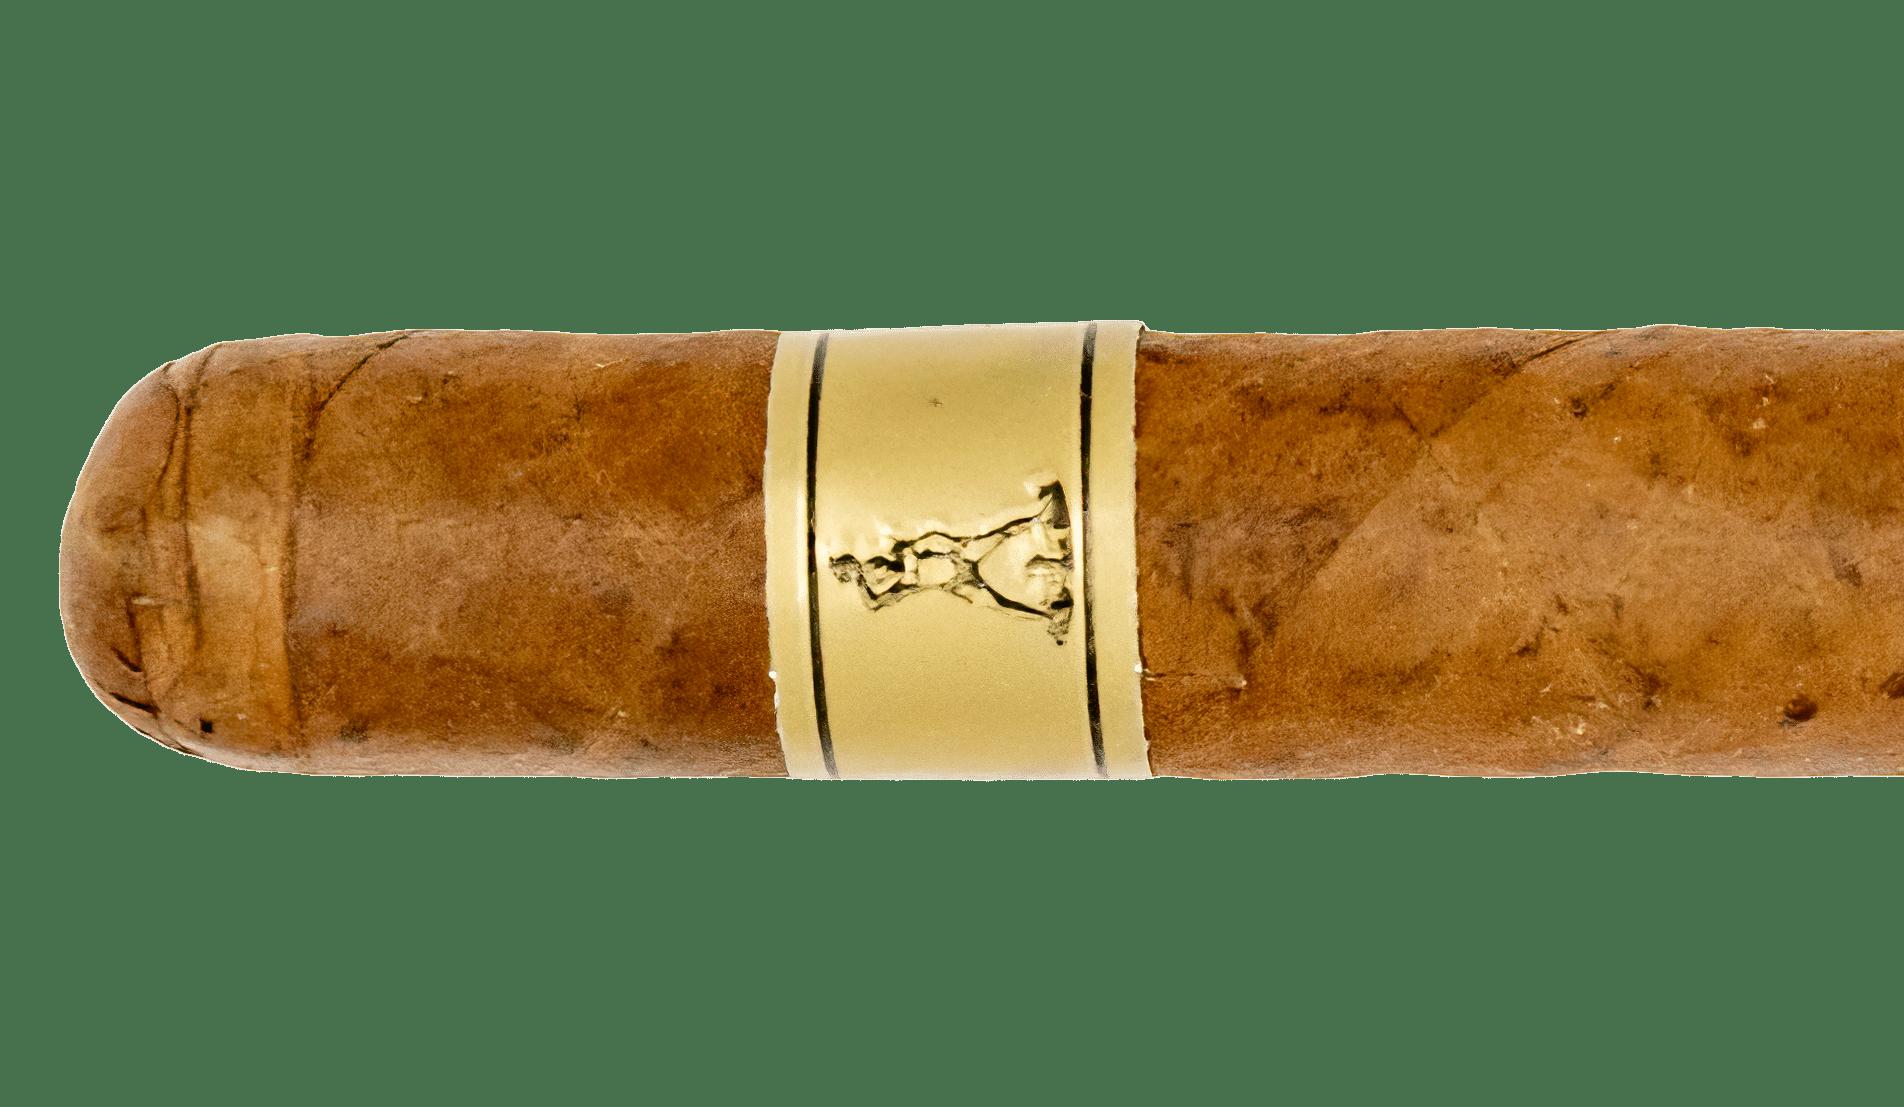 Casdagli Cabinet Selection Romano - Blind Cigar Review